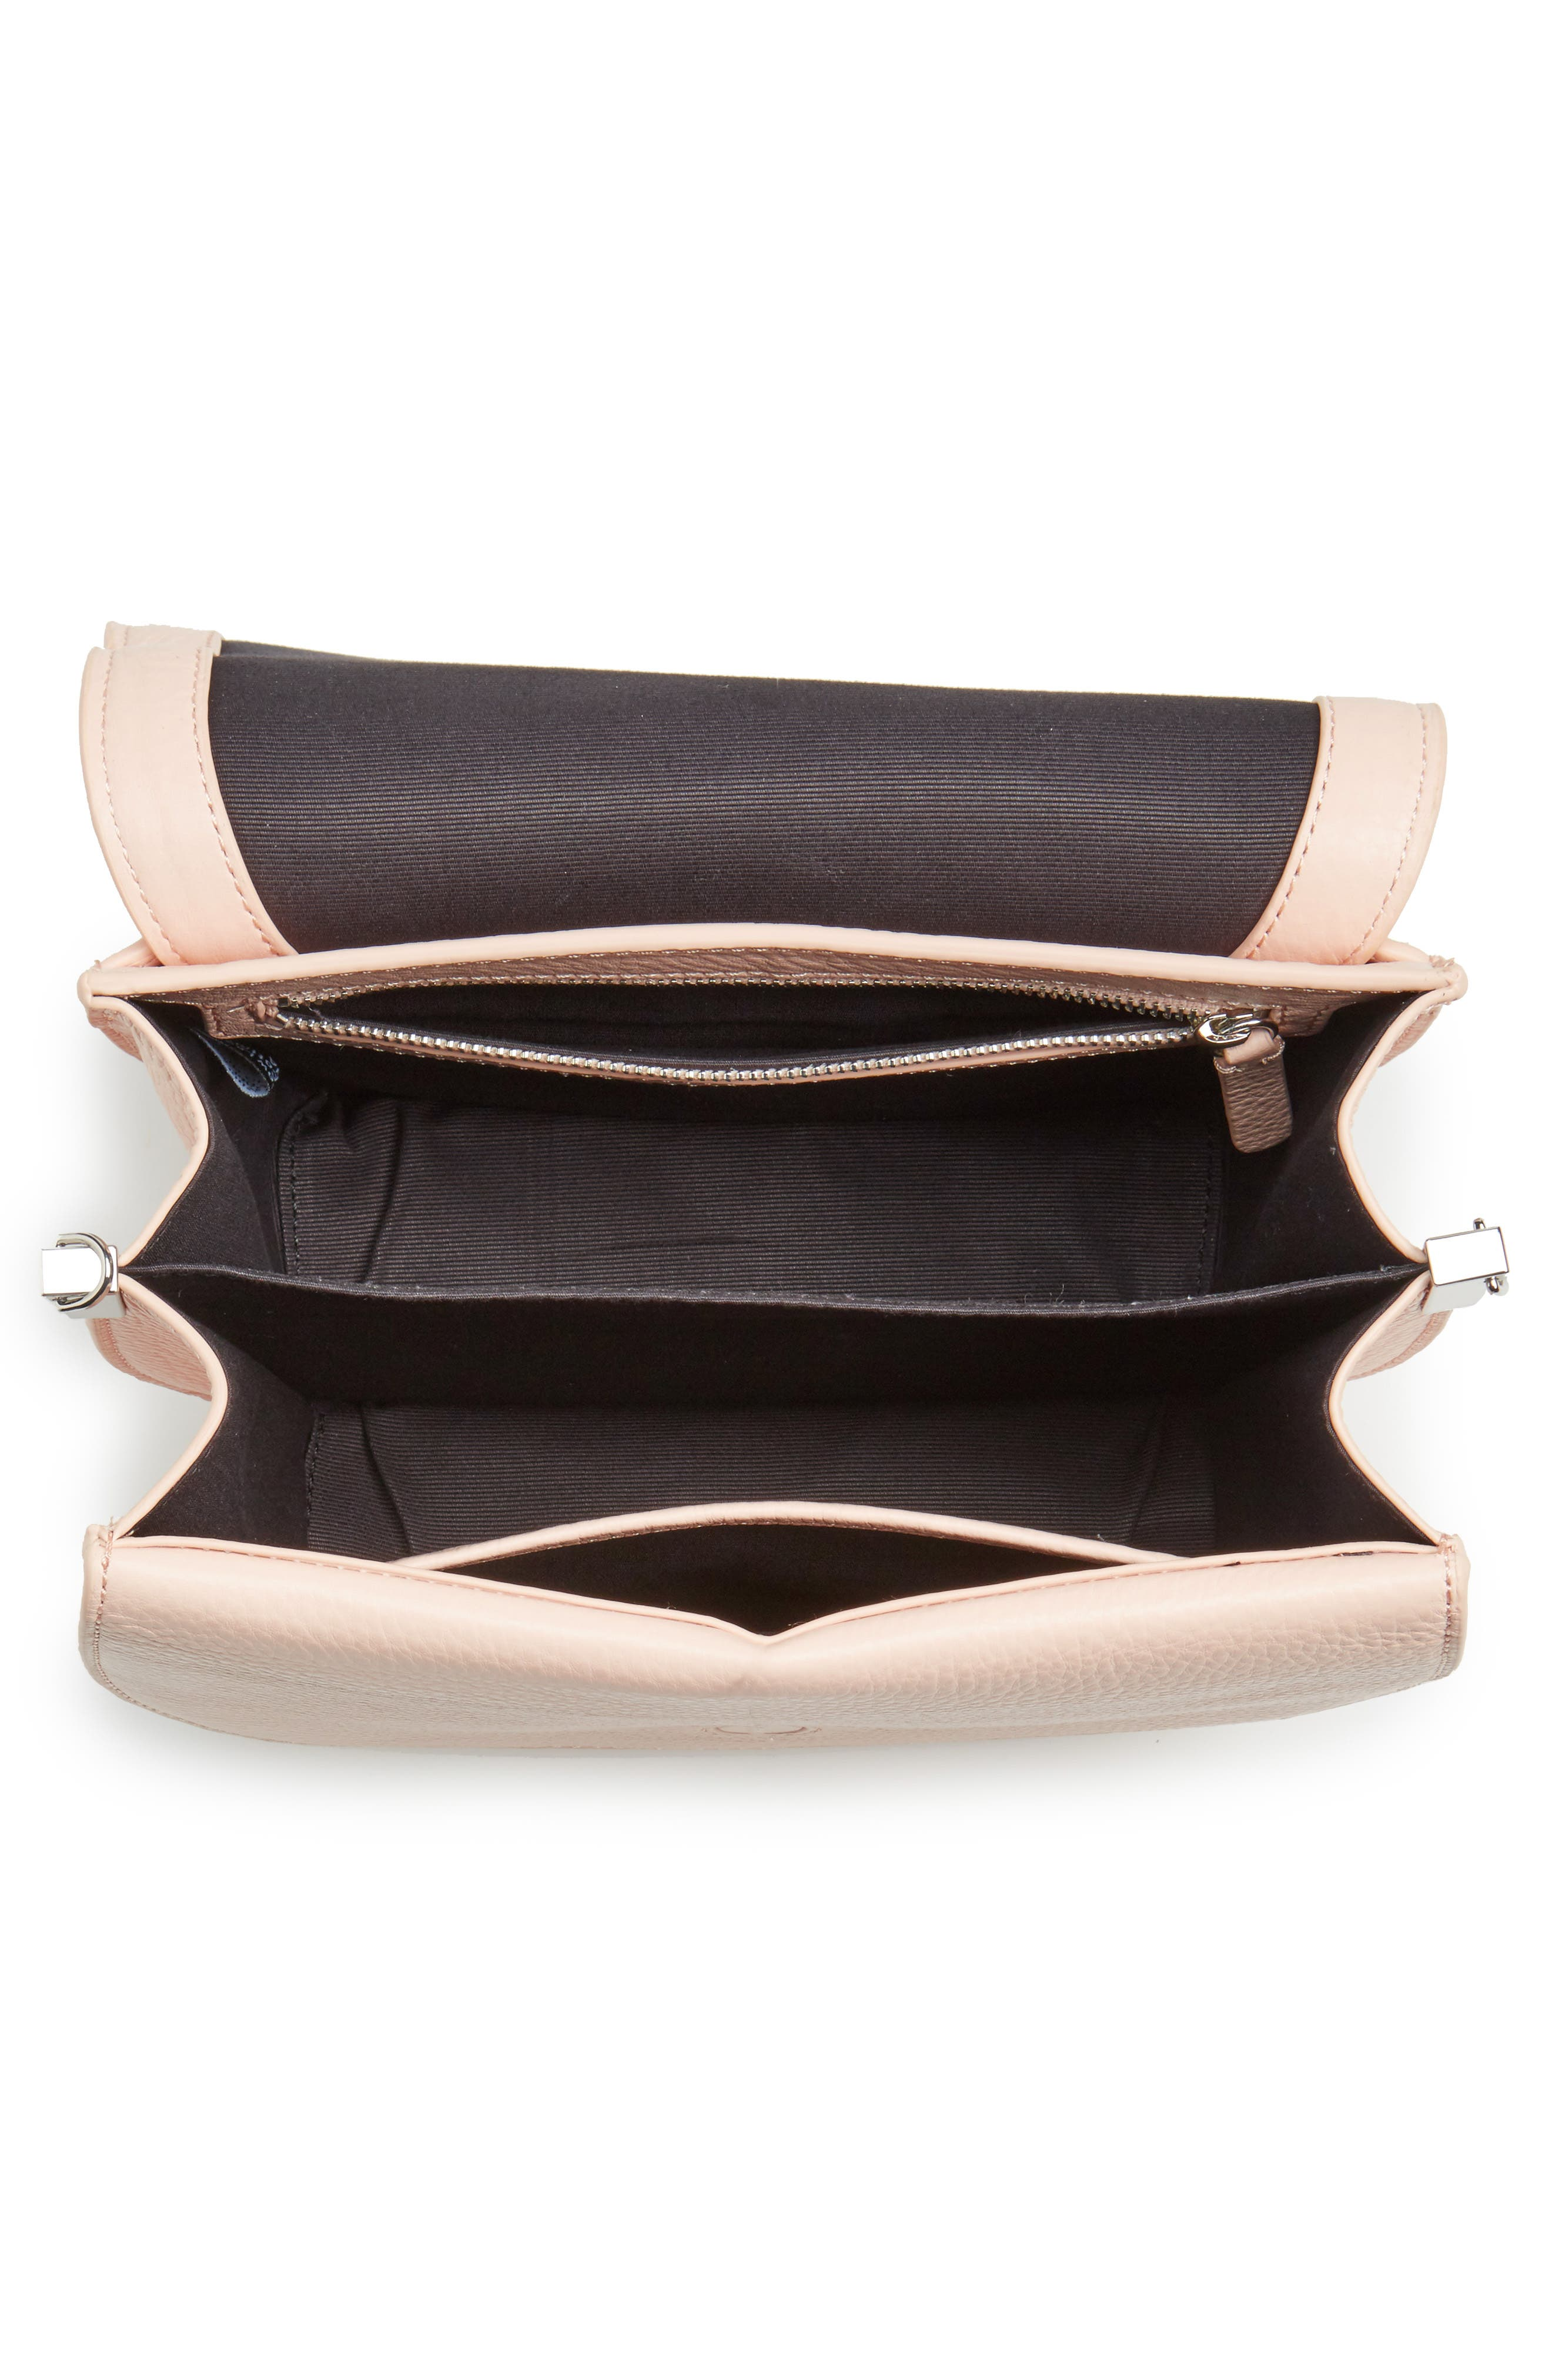 Landon Leather Crossbody Saddle Bag,                             Alternate thumbnail 15, color,